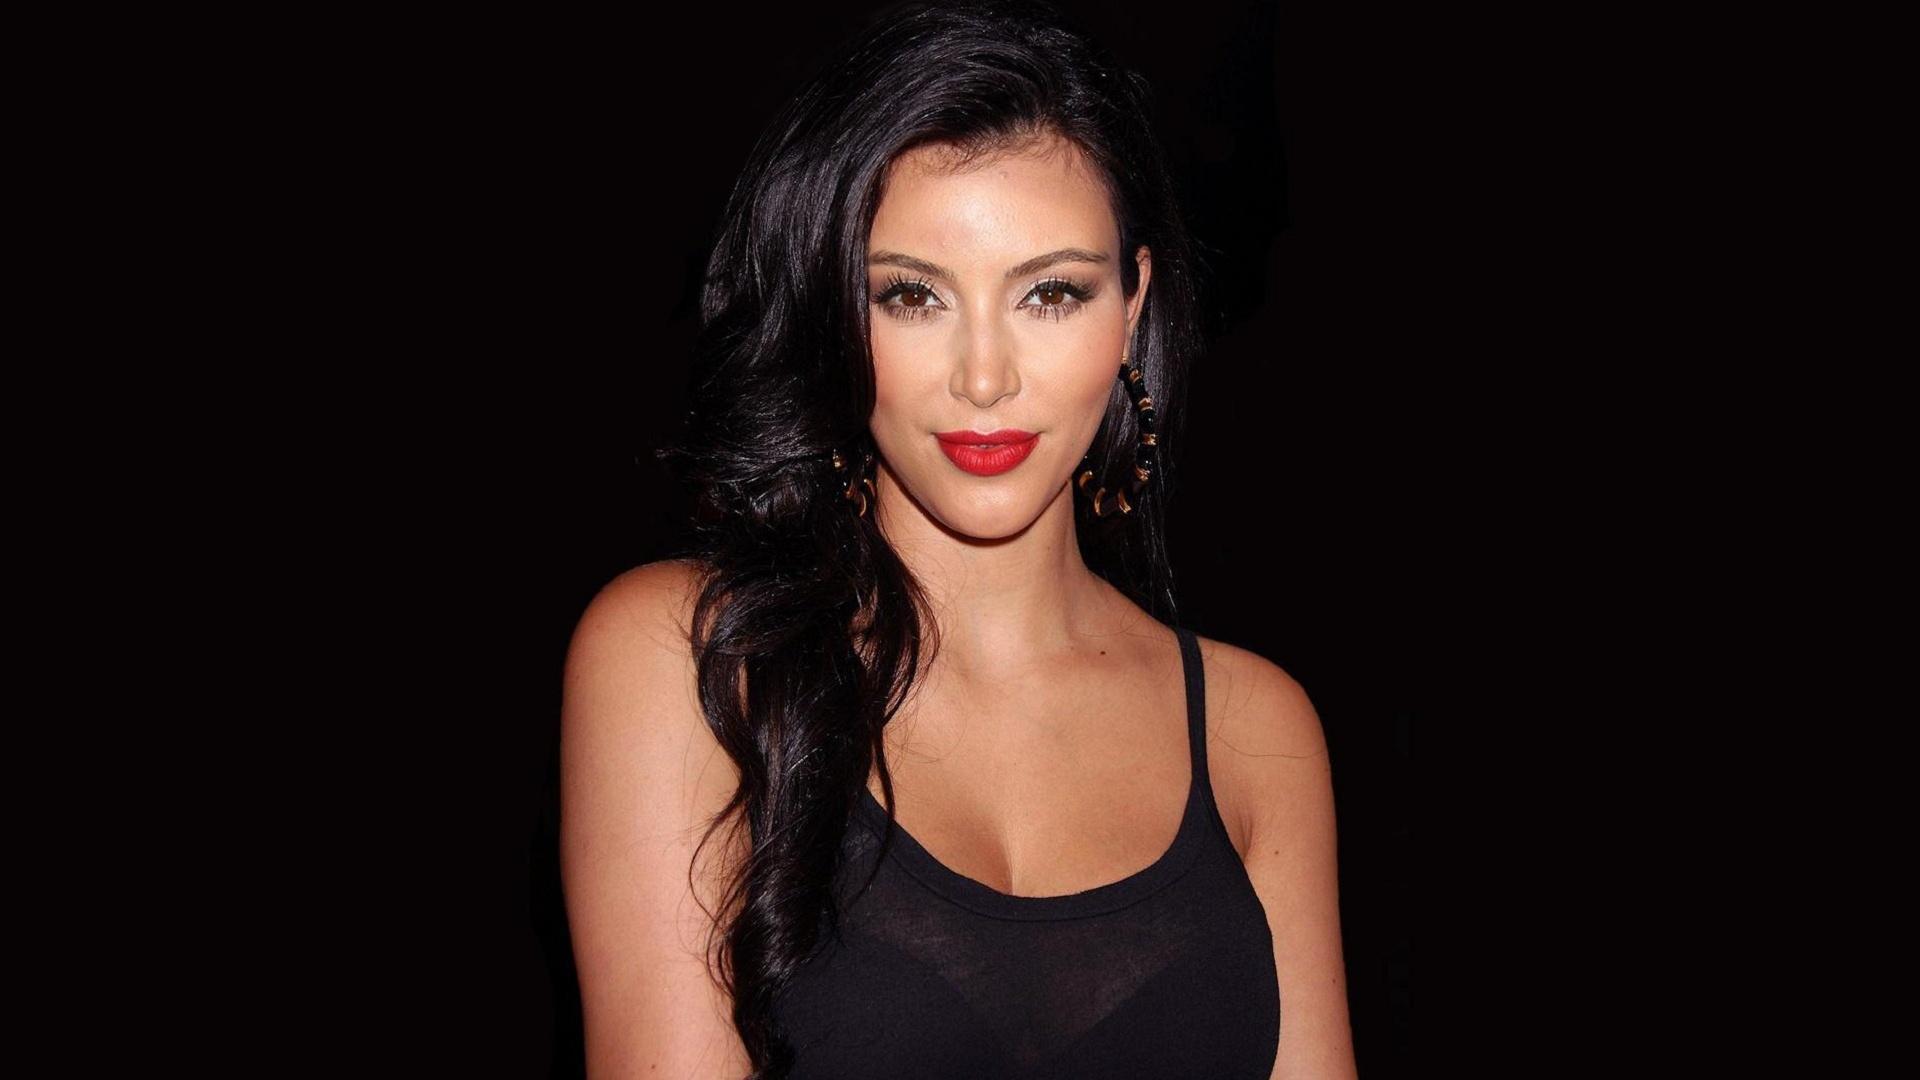 Ким Кардашян удивила поклонников без макияжа